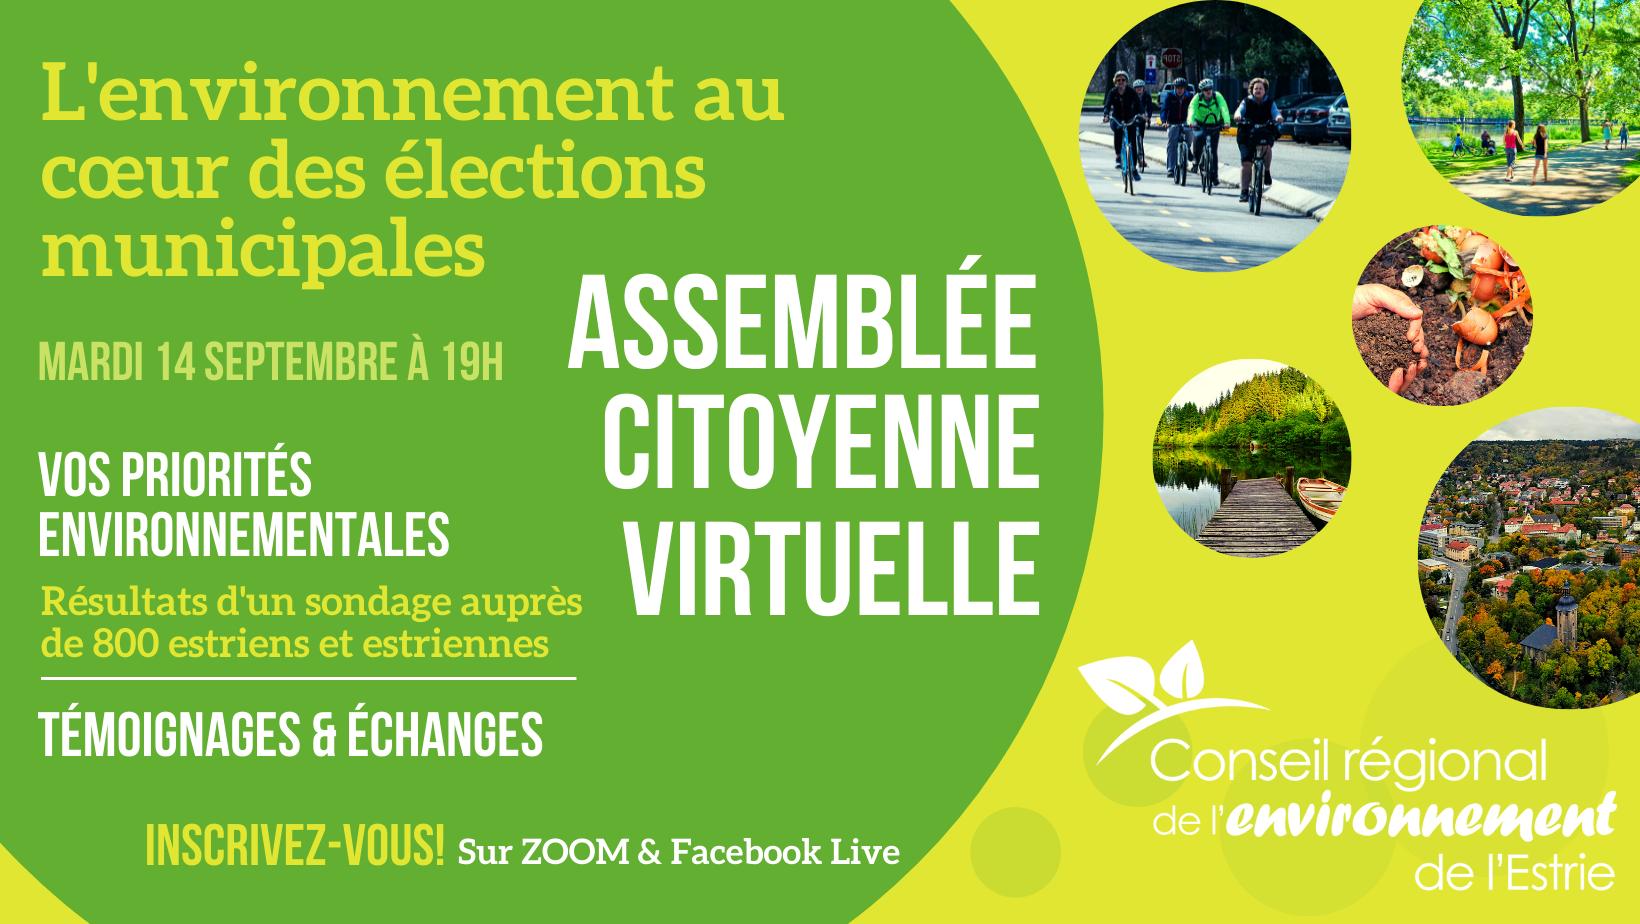 Virtual citizen's assembly